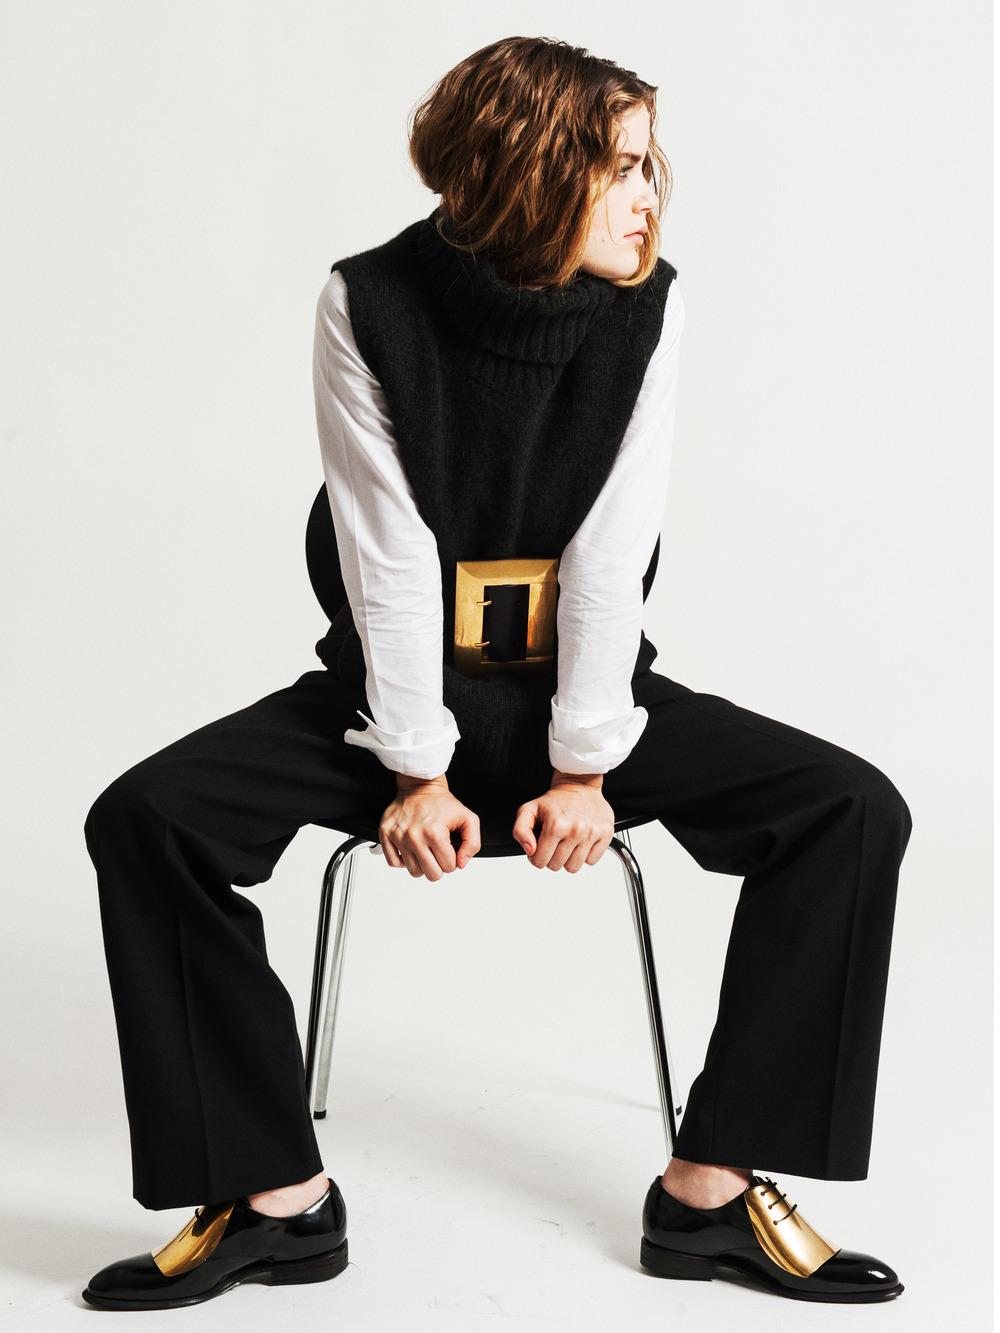 Fashion_by_LeandroJusten_003.jpg